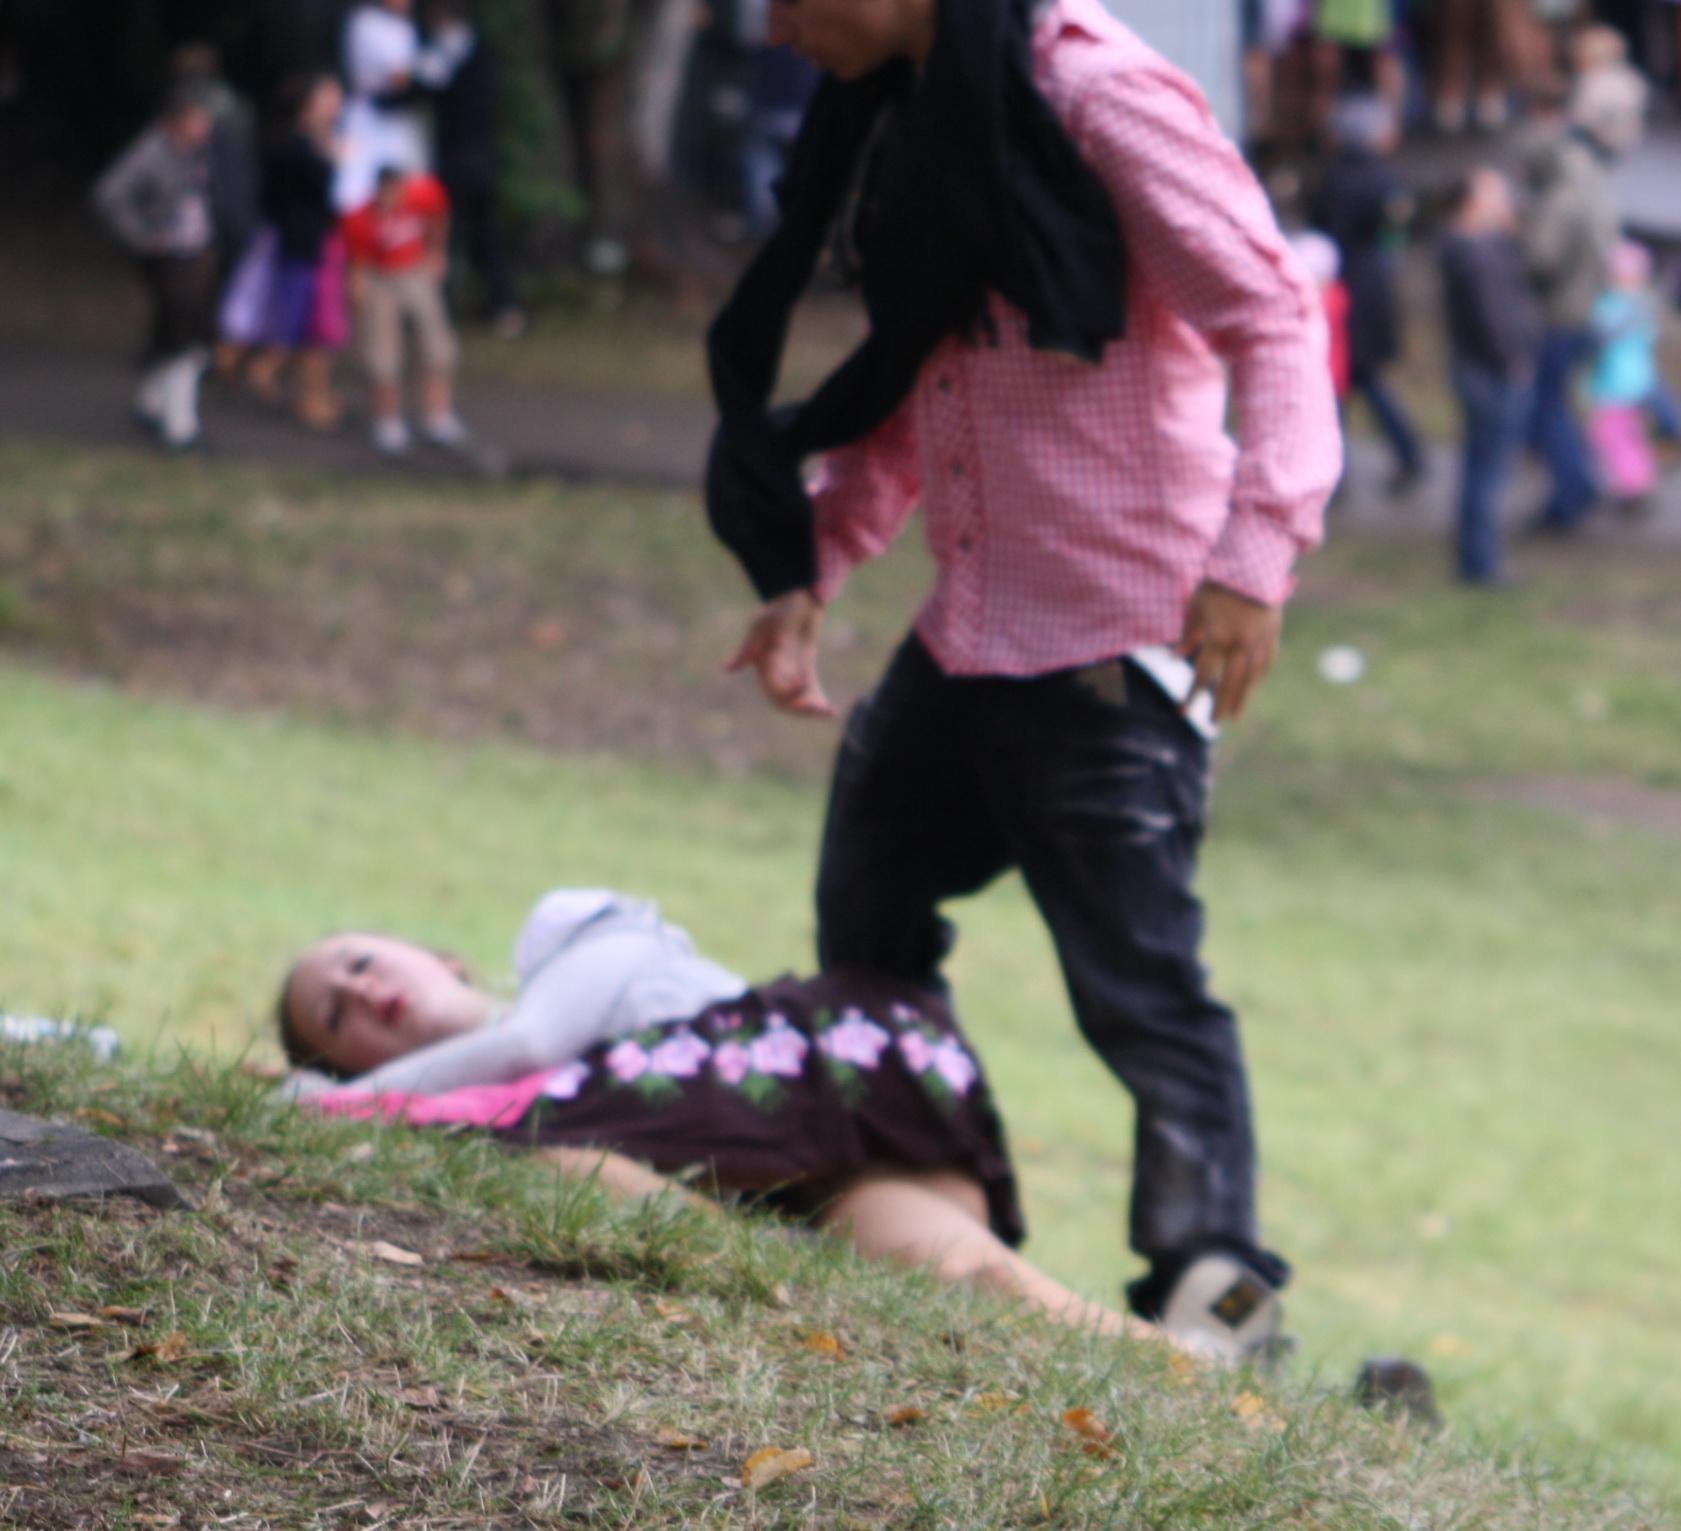 File:Betrunkene Frau am Oktoberfest im Dirndl.JPG